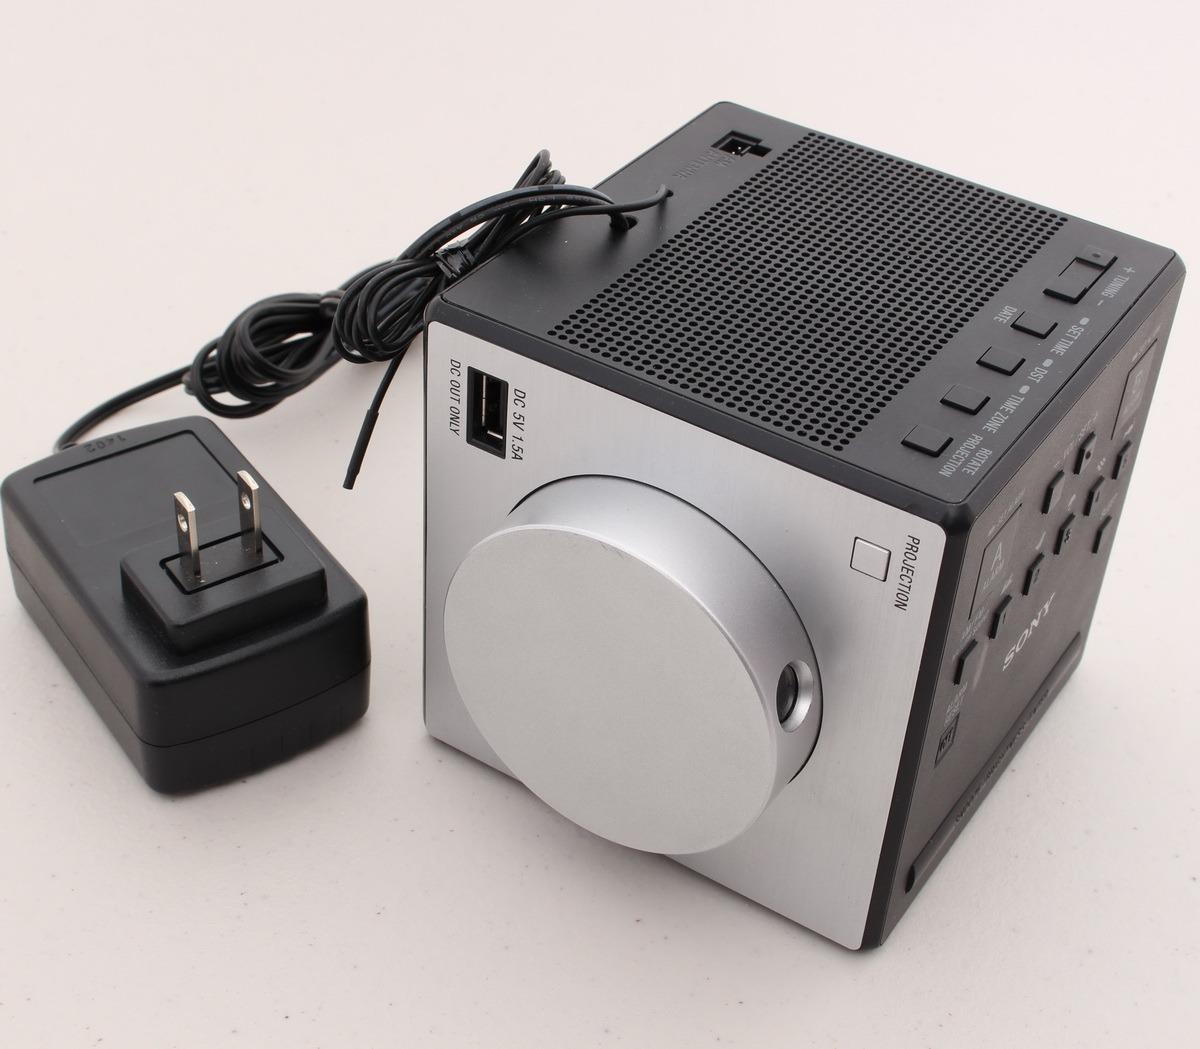 sony alarm clock radio time projection large lcd display icfc1pj icf c1pj used. Black Bedroom Furniture Sets. Home Design Ideas